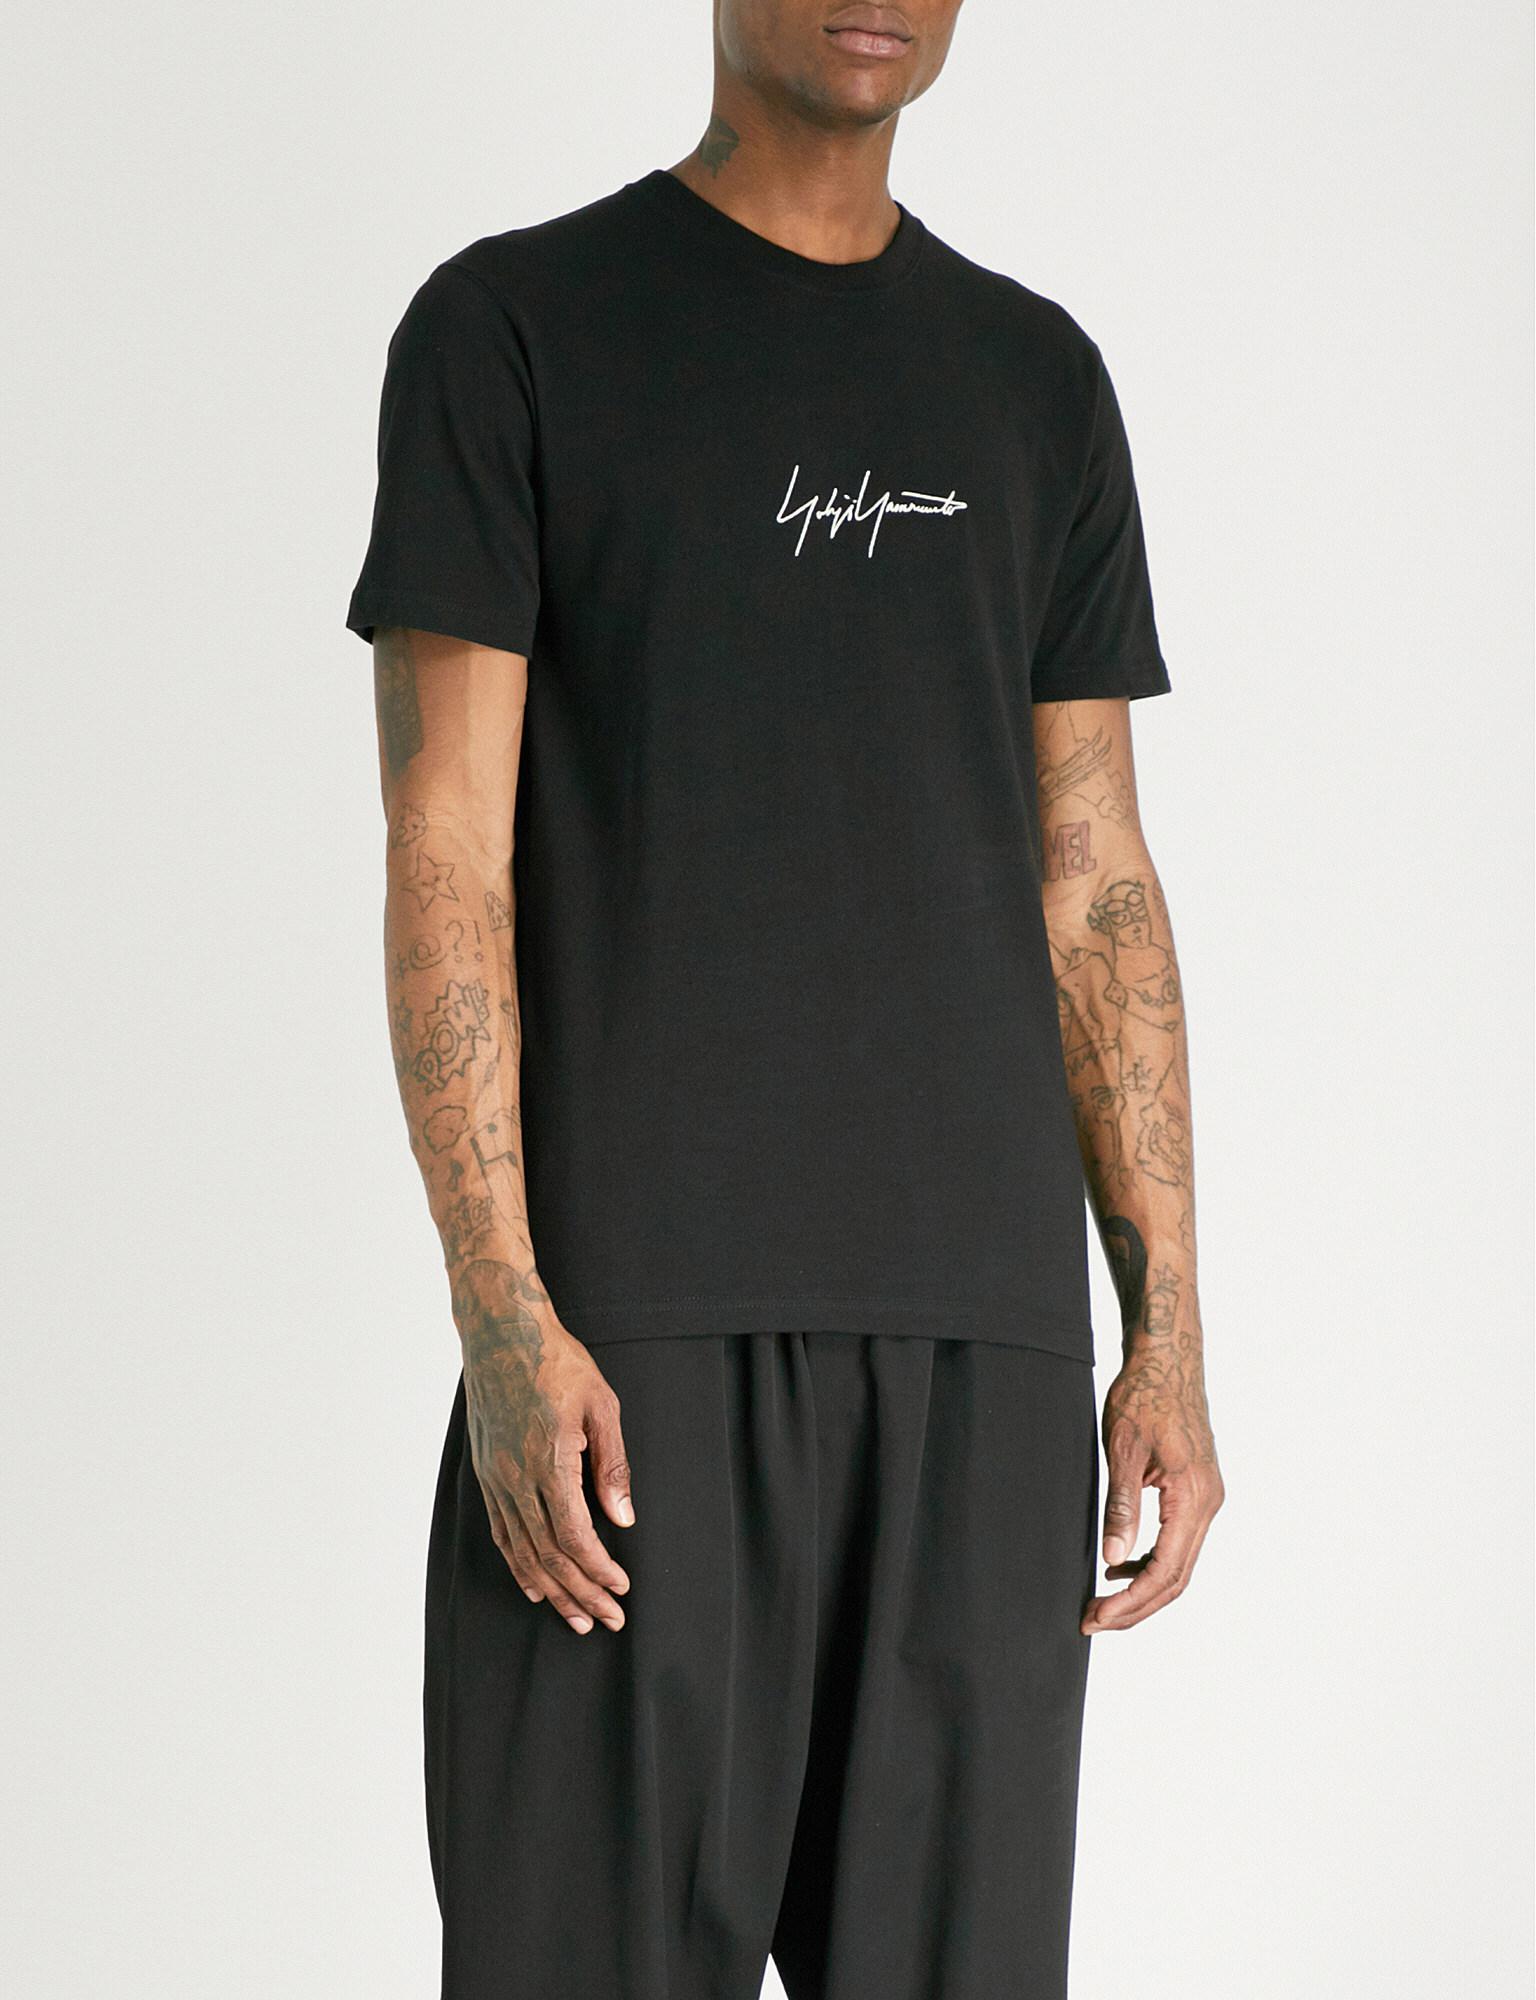 Cheapest Store Cheap Online Black Jersey Logo T-Shirt Yohji Yamamoto Manchester Great Sale Online NrsBvGRF6Y